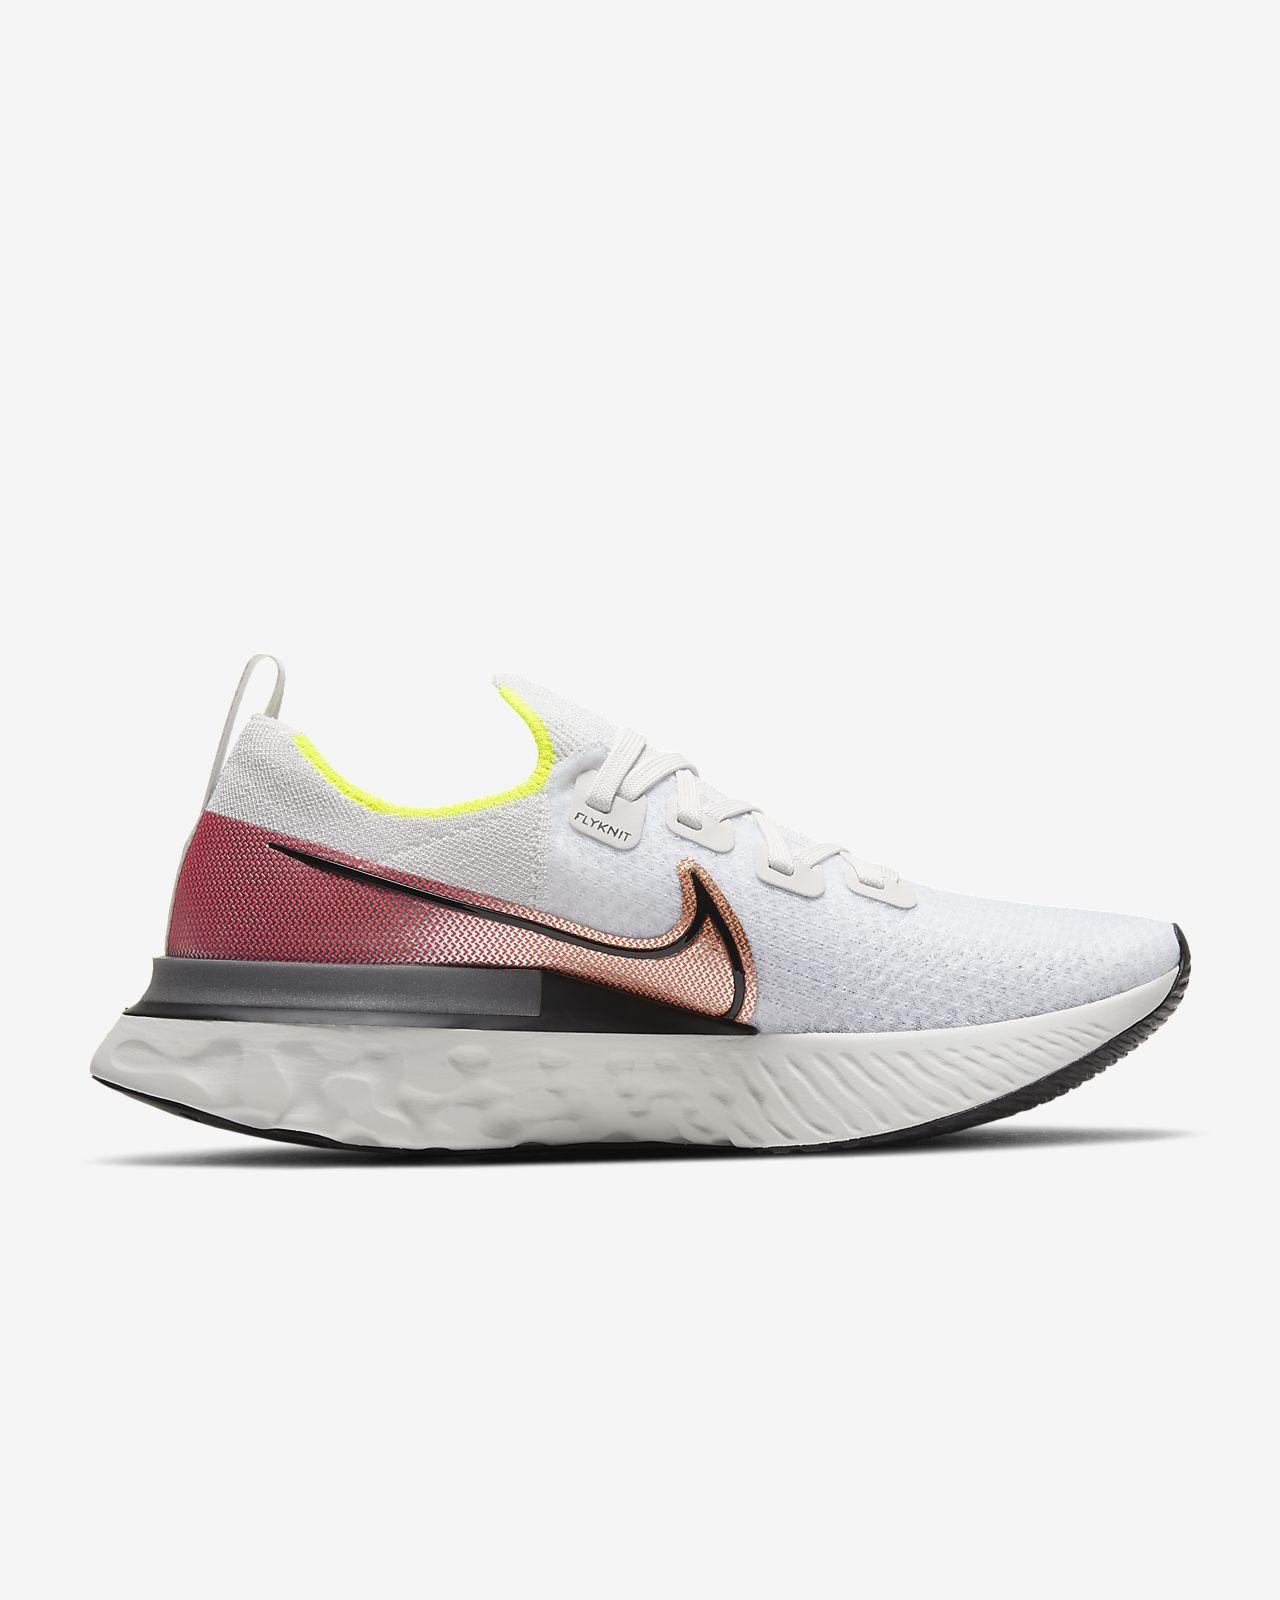 Nike Joyride Run FK, dame. Löplabbet